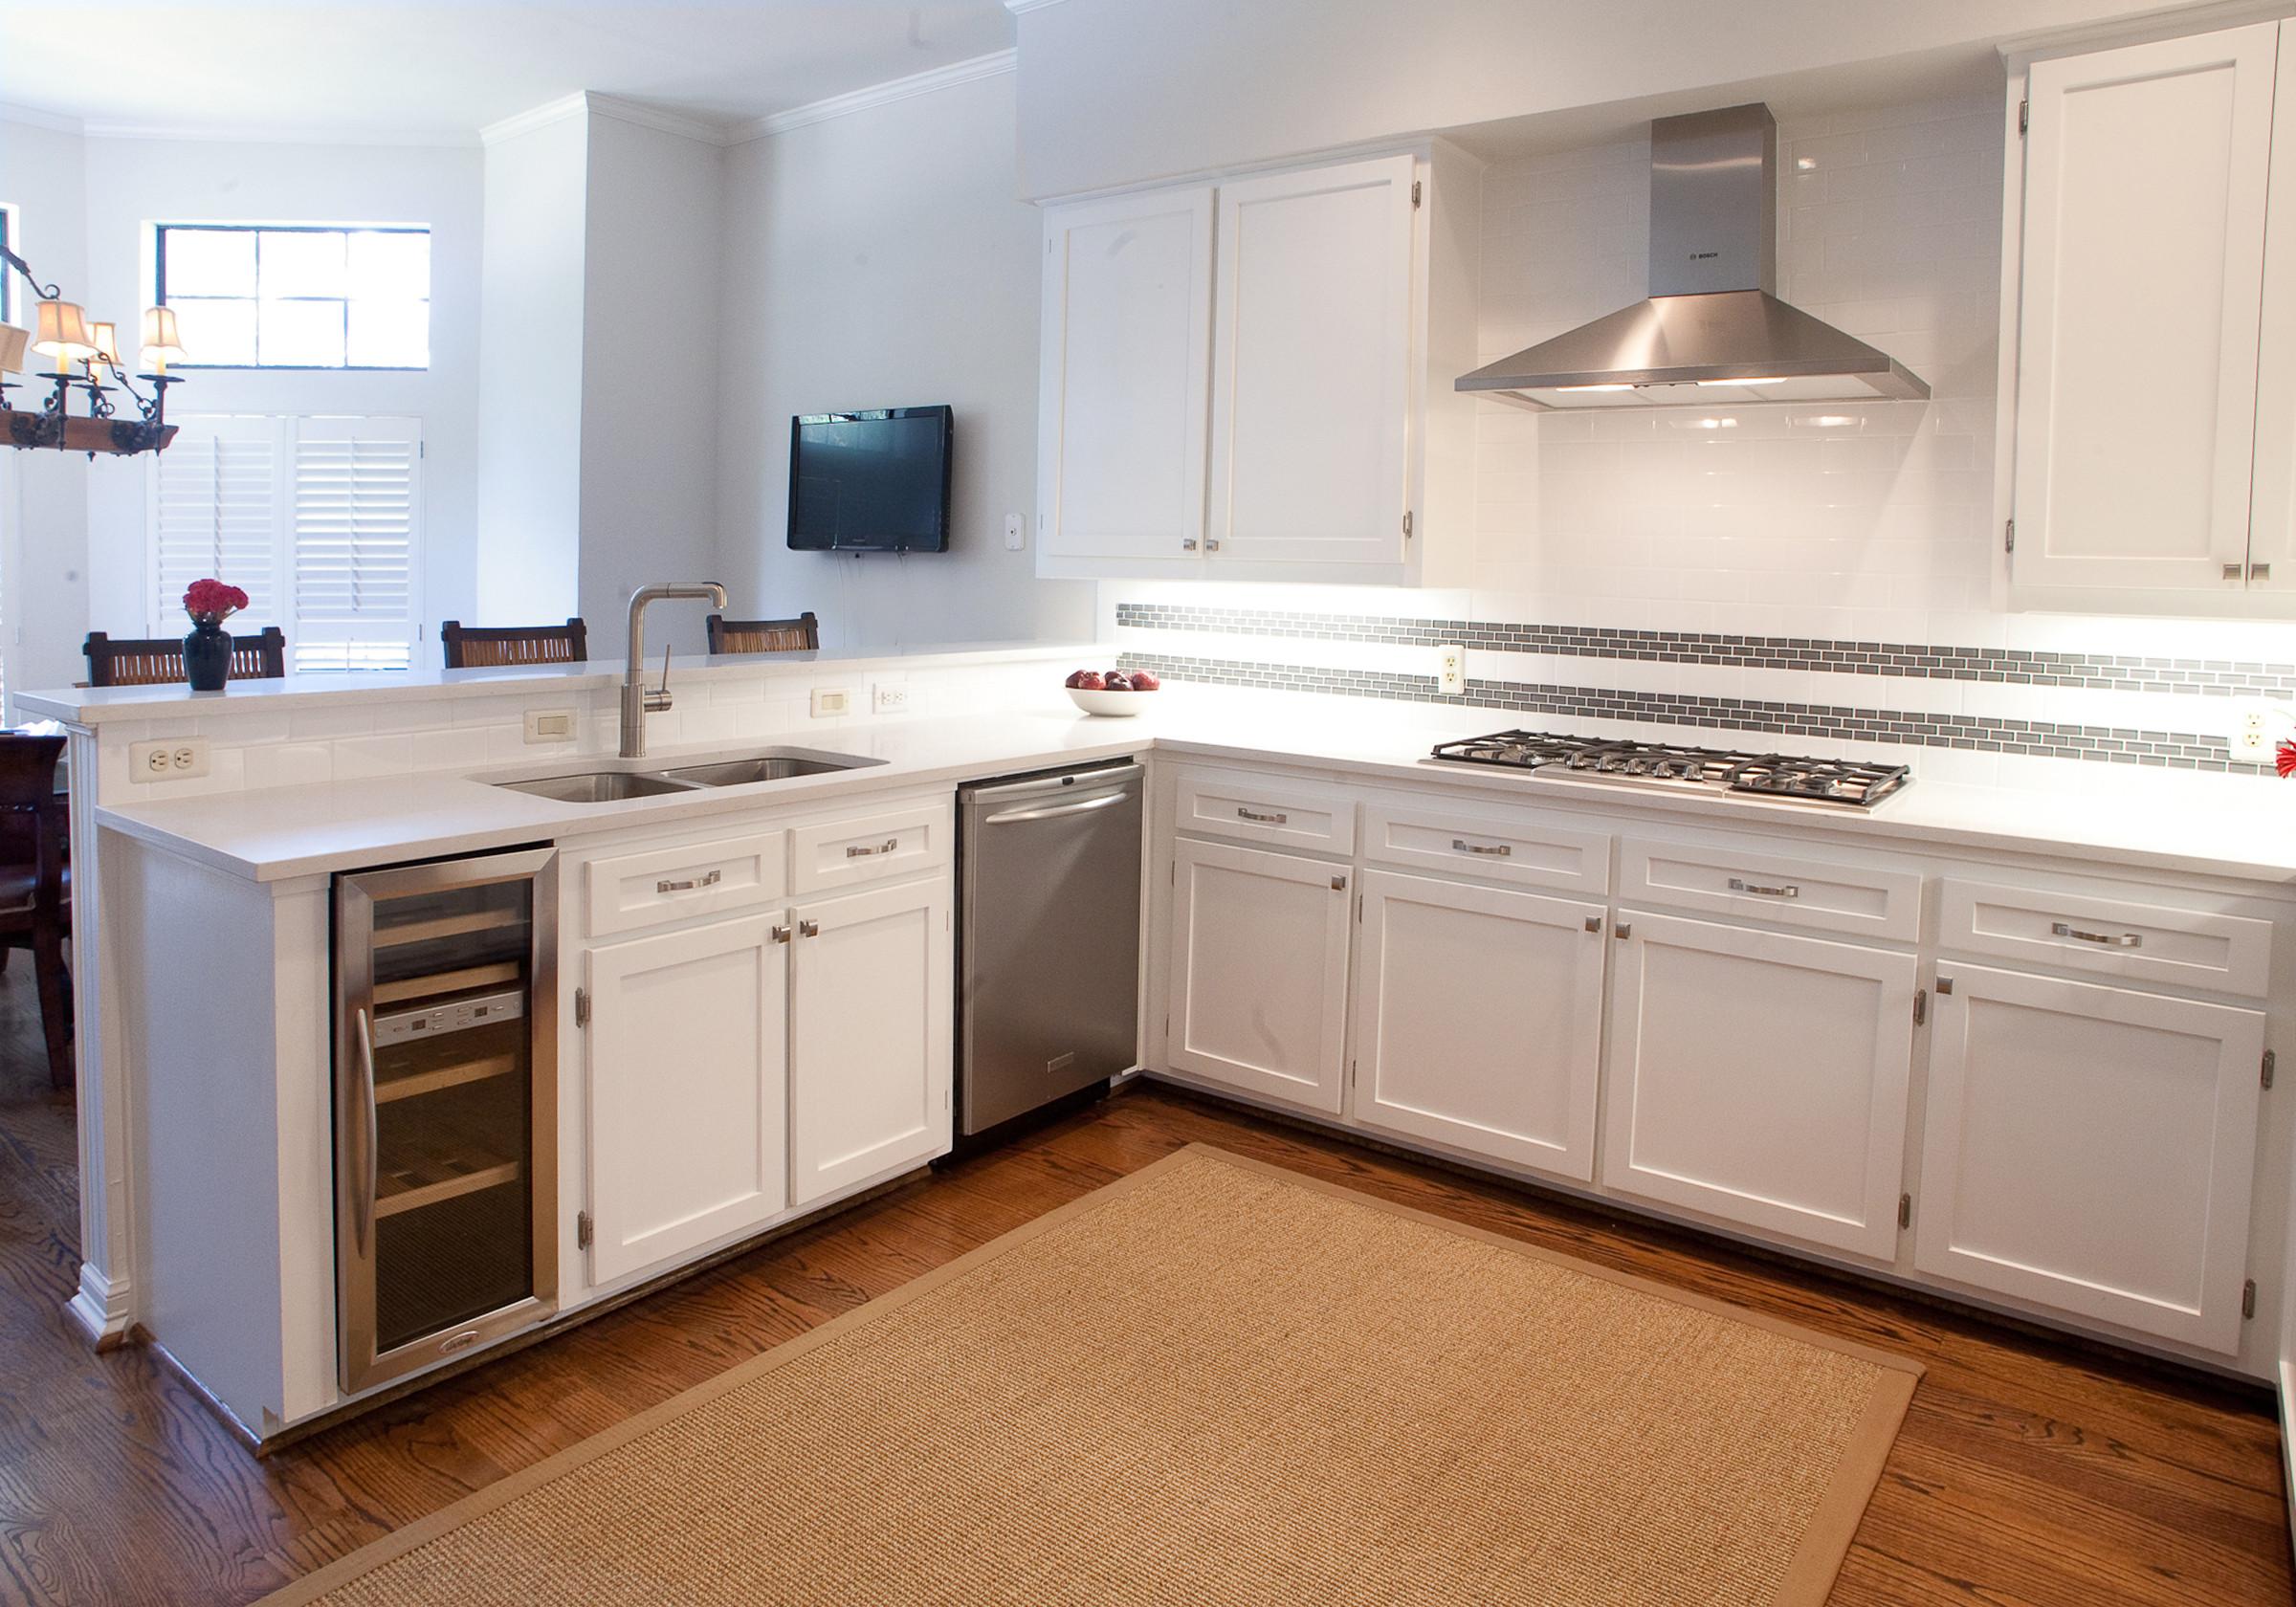 Snappy Kitchens Remodel Traditional Kitchen Atlanta By Showpiece Kitchen Bath Houzz